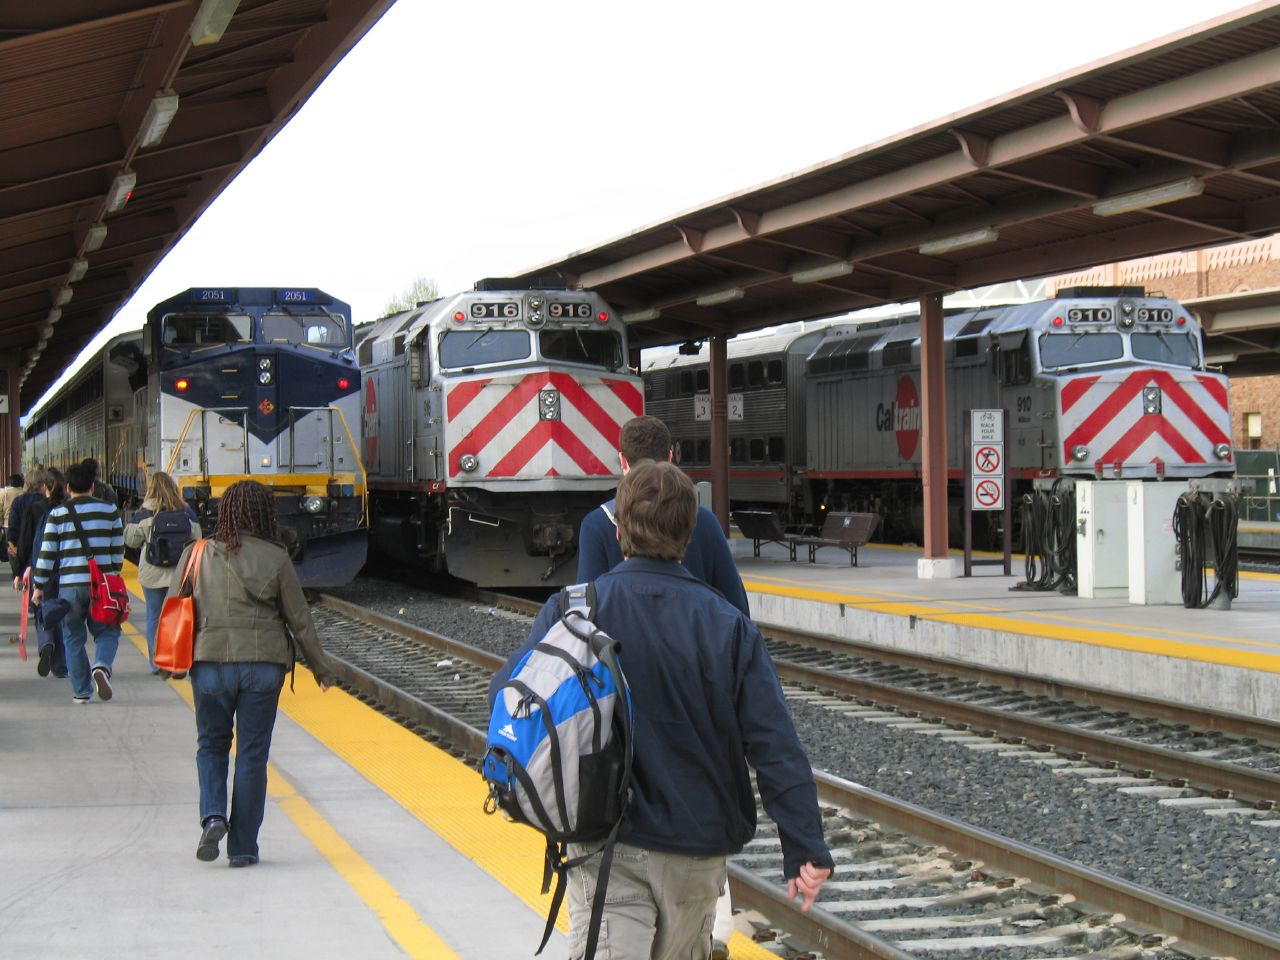 Passengers head toward the trains on one of Diridon Station's multiple platforms.